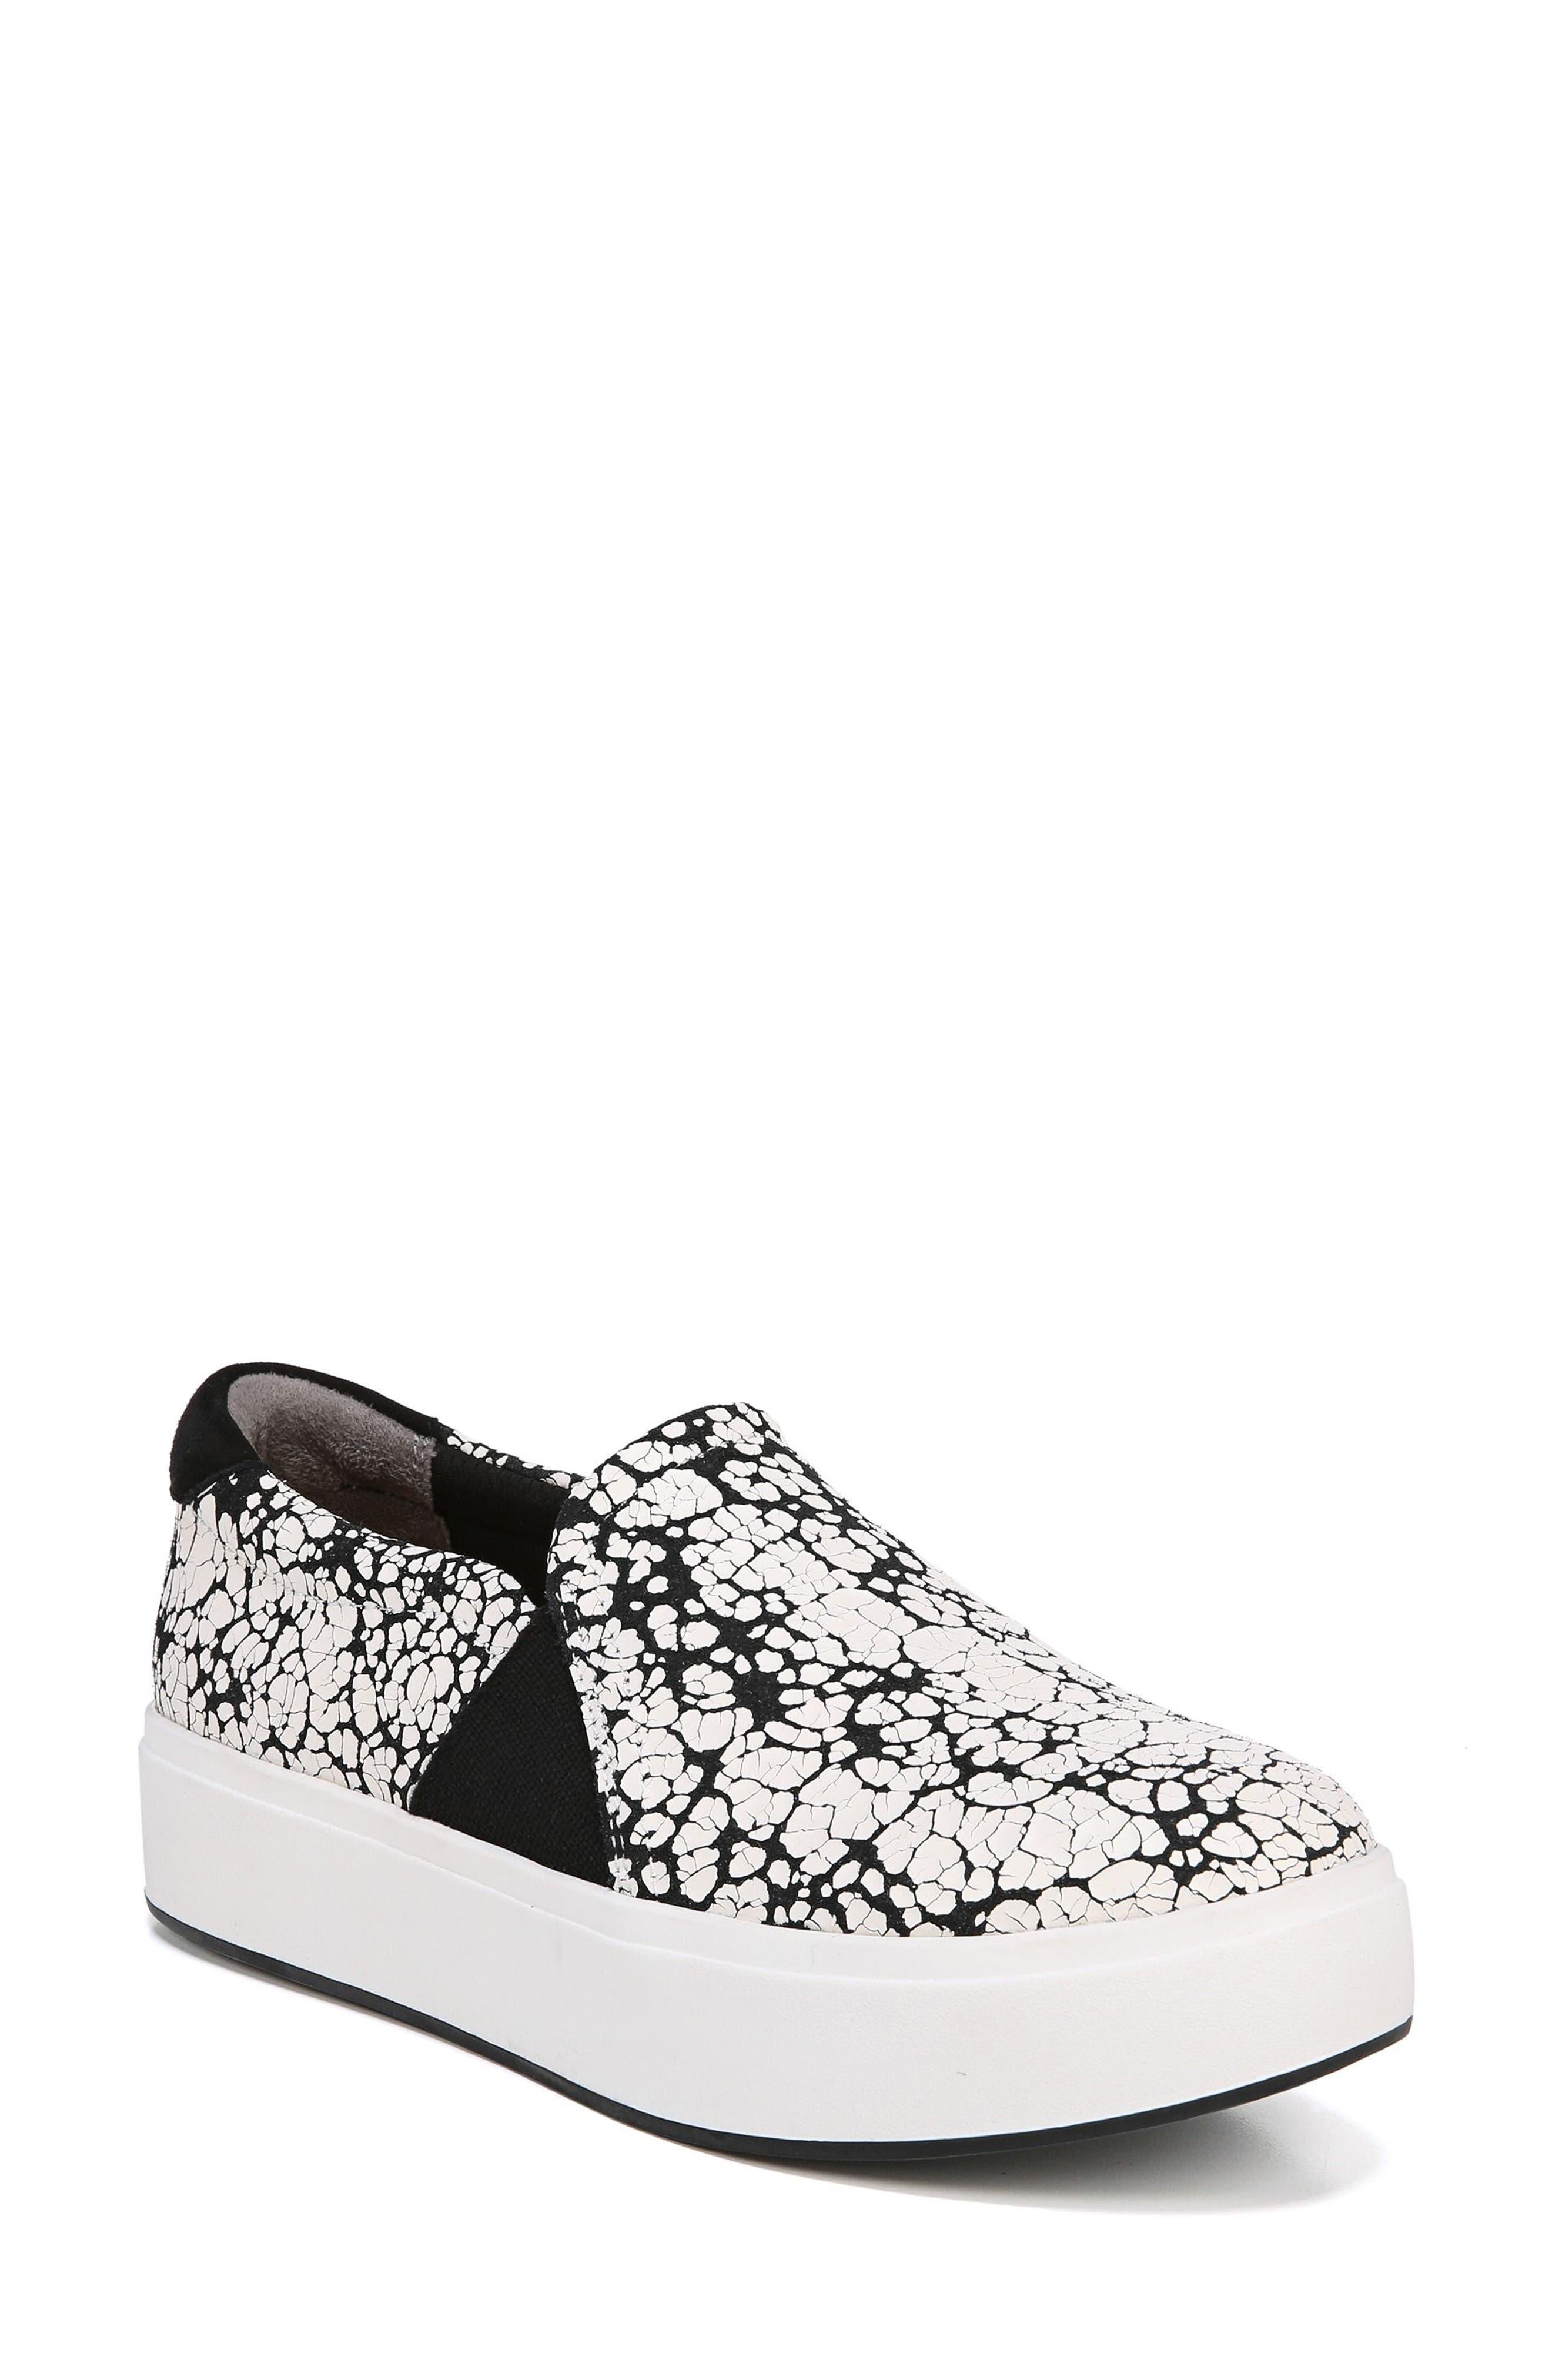 1765f709046 ... UPC 736703004532 product image for Women s Dr. Scholl s Abbot Slip-On  Sneaker